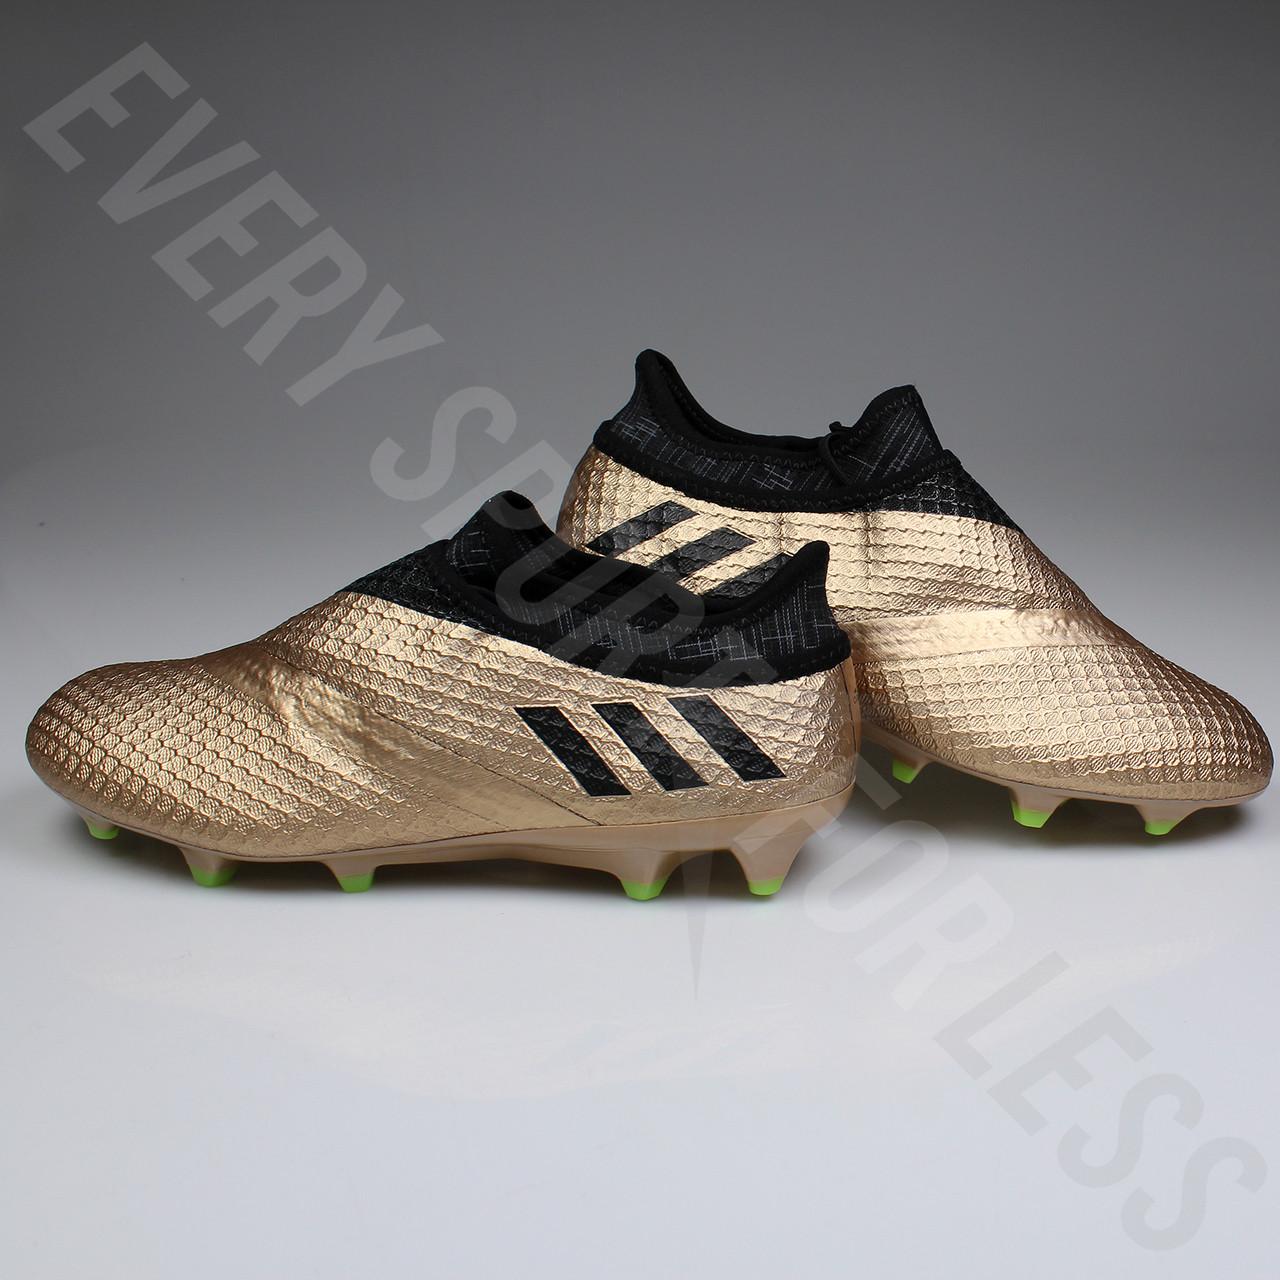 99e04e4c8 ... adidas messi 16 pureagility fg mens soccer cleats ba9821 black copper